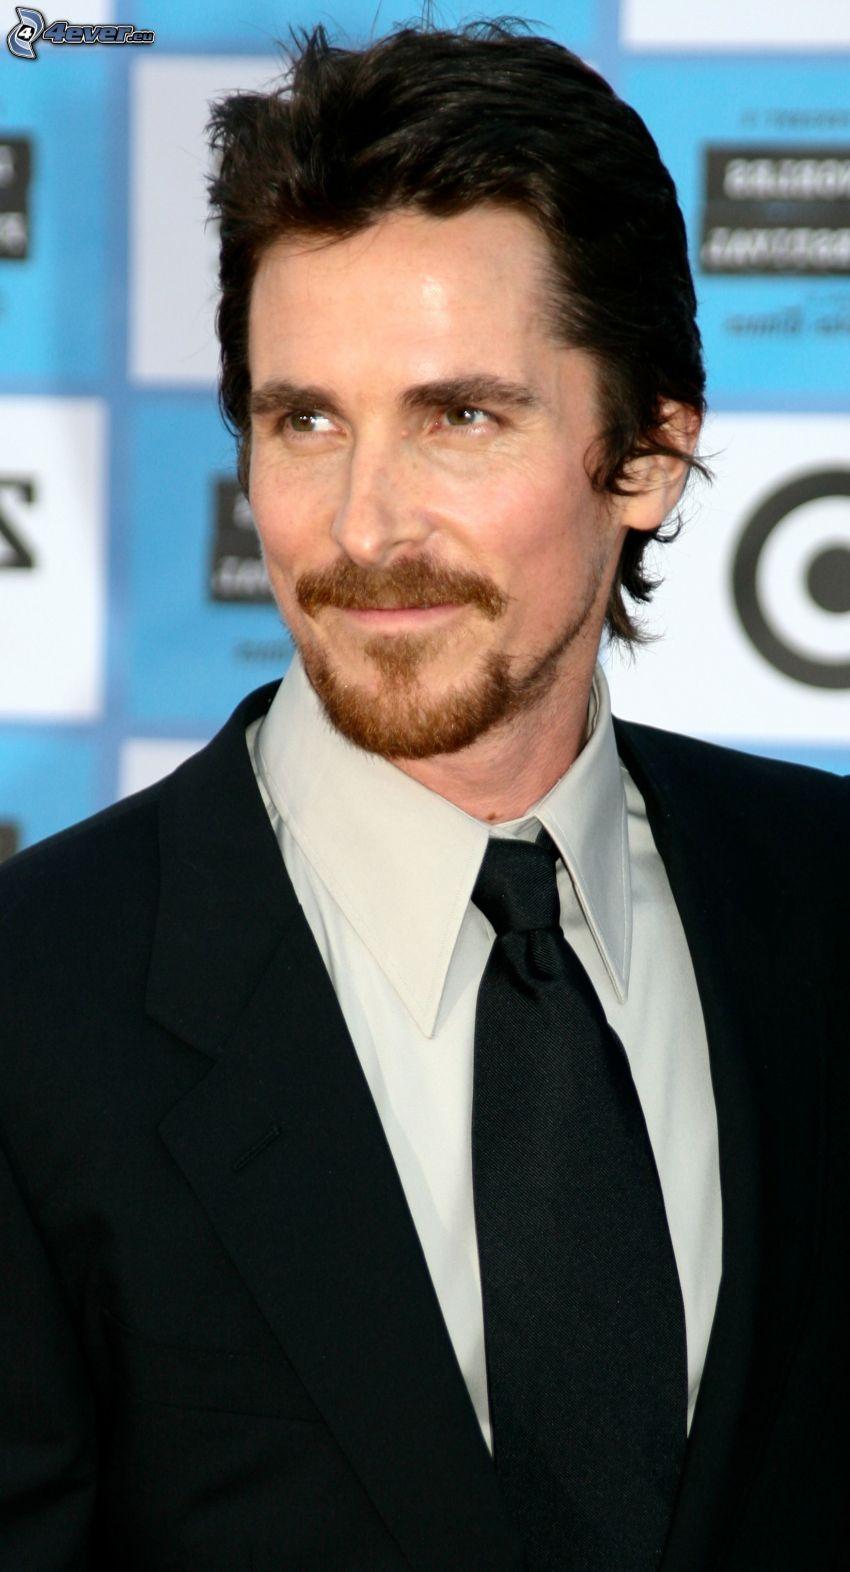 Christian Bale, hombre en traje